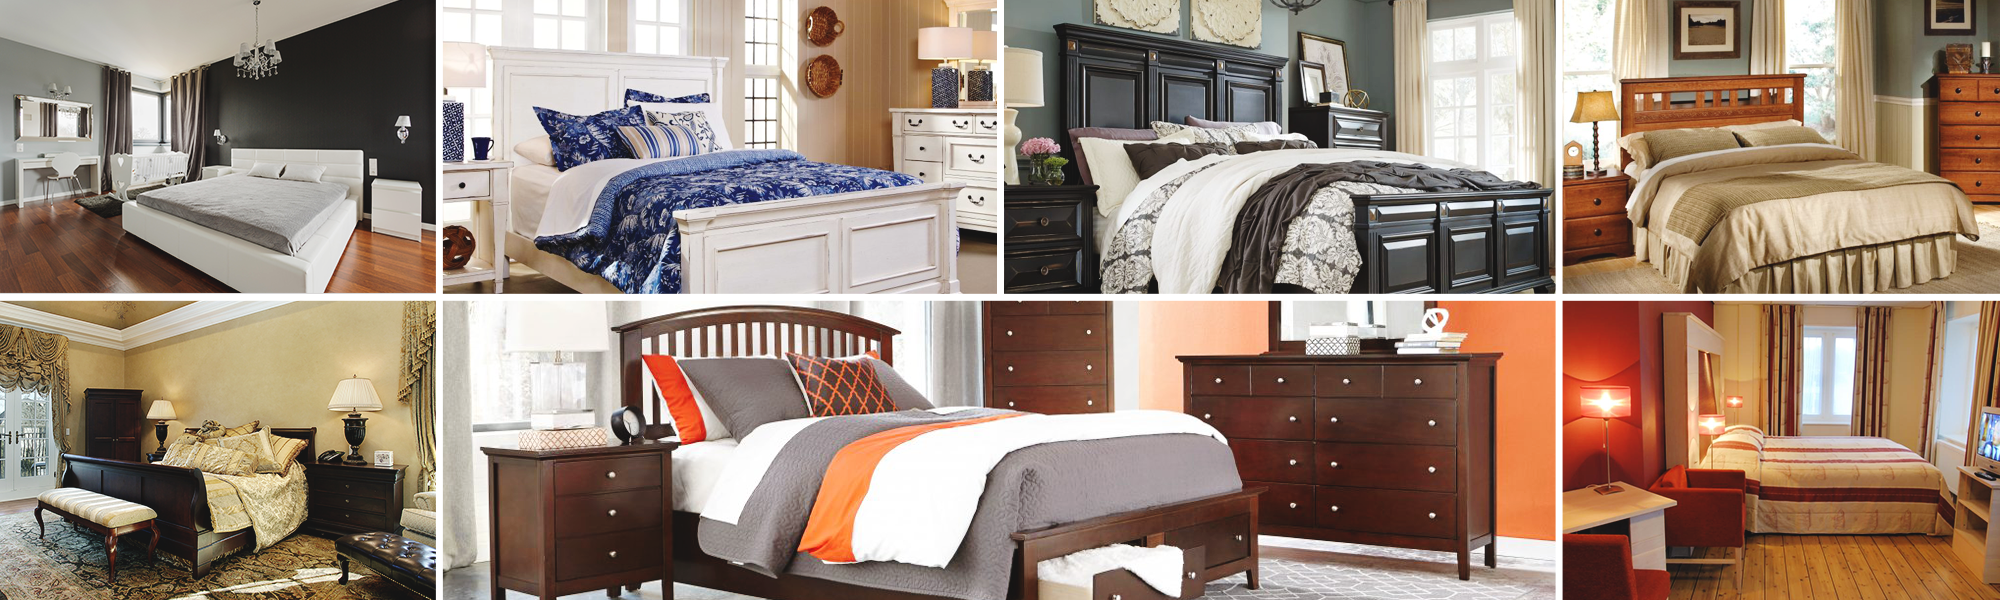 Youth bedroom sets bedroom furniture detroit mi - Bedroom furniture stores michigan ...